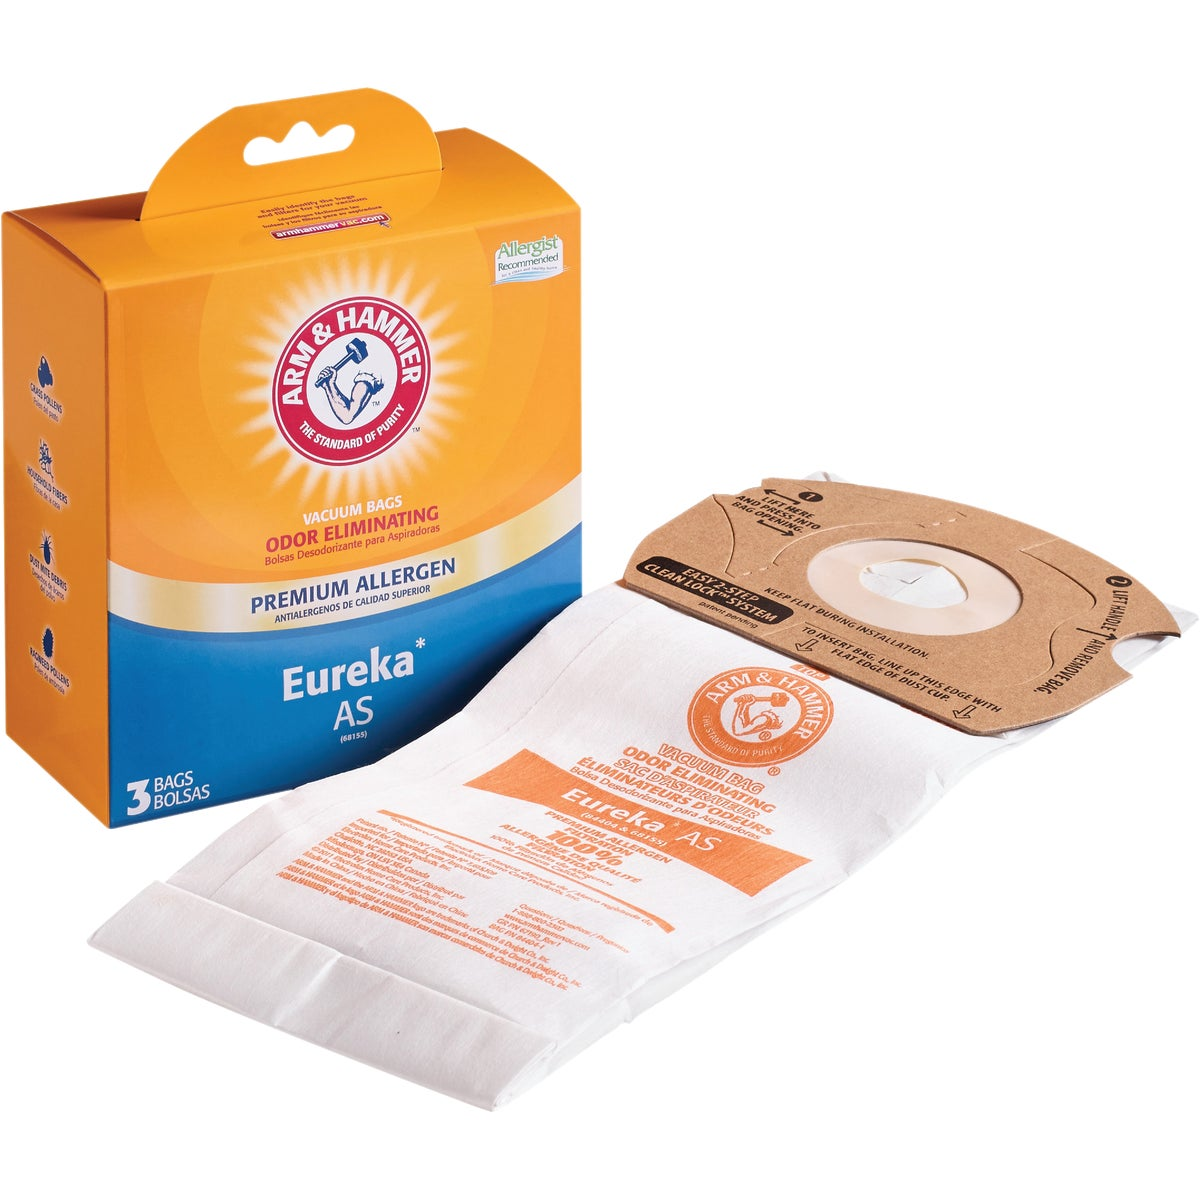 3M Filtrete Eureka Type AS Micro Allergen Vacuum Bag (3-Pack)